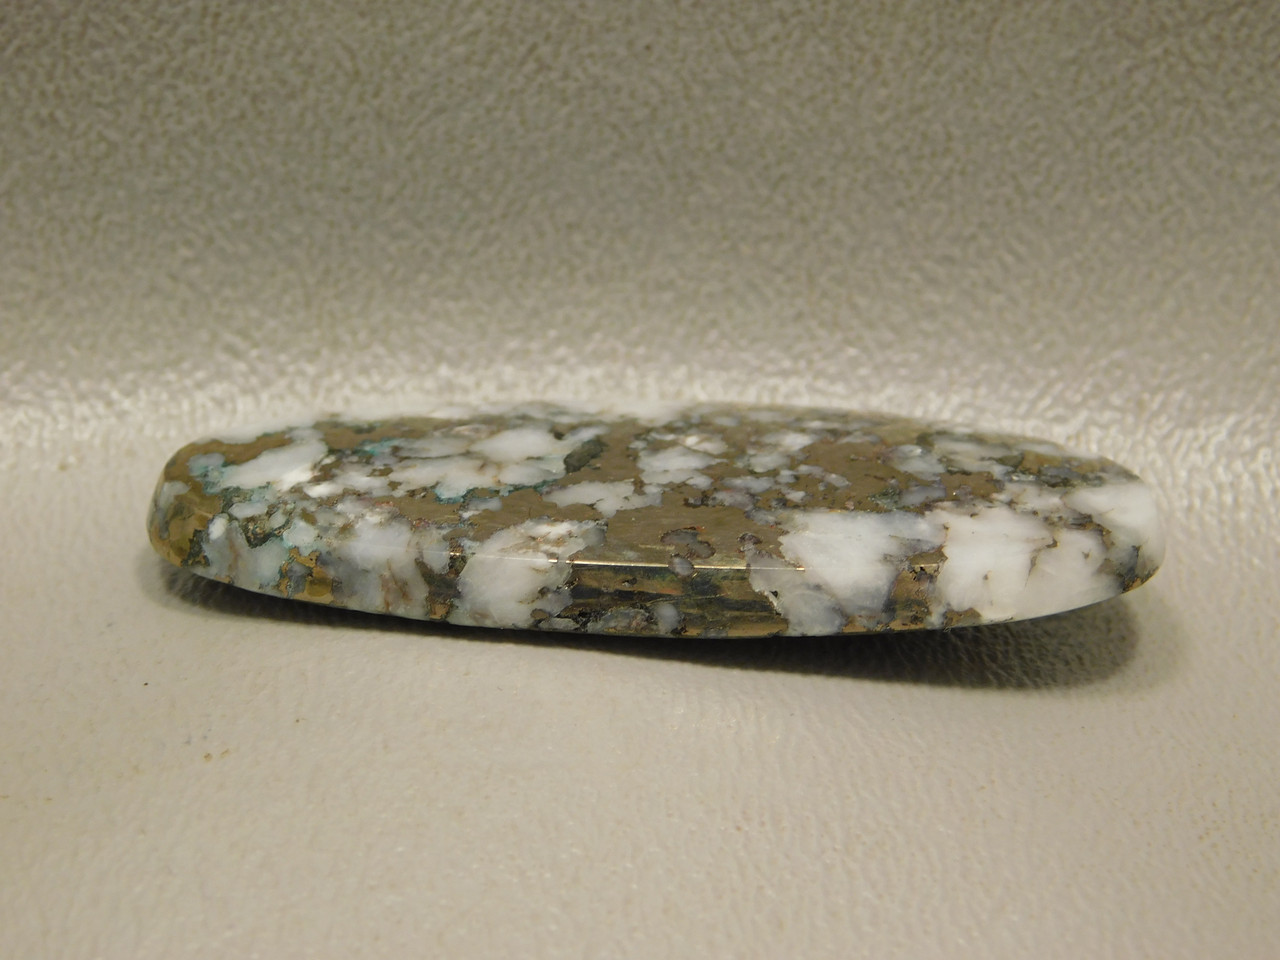 Metallic Mohawkite Stone Cabochons Jewelry Making Supplies  #11